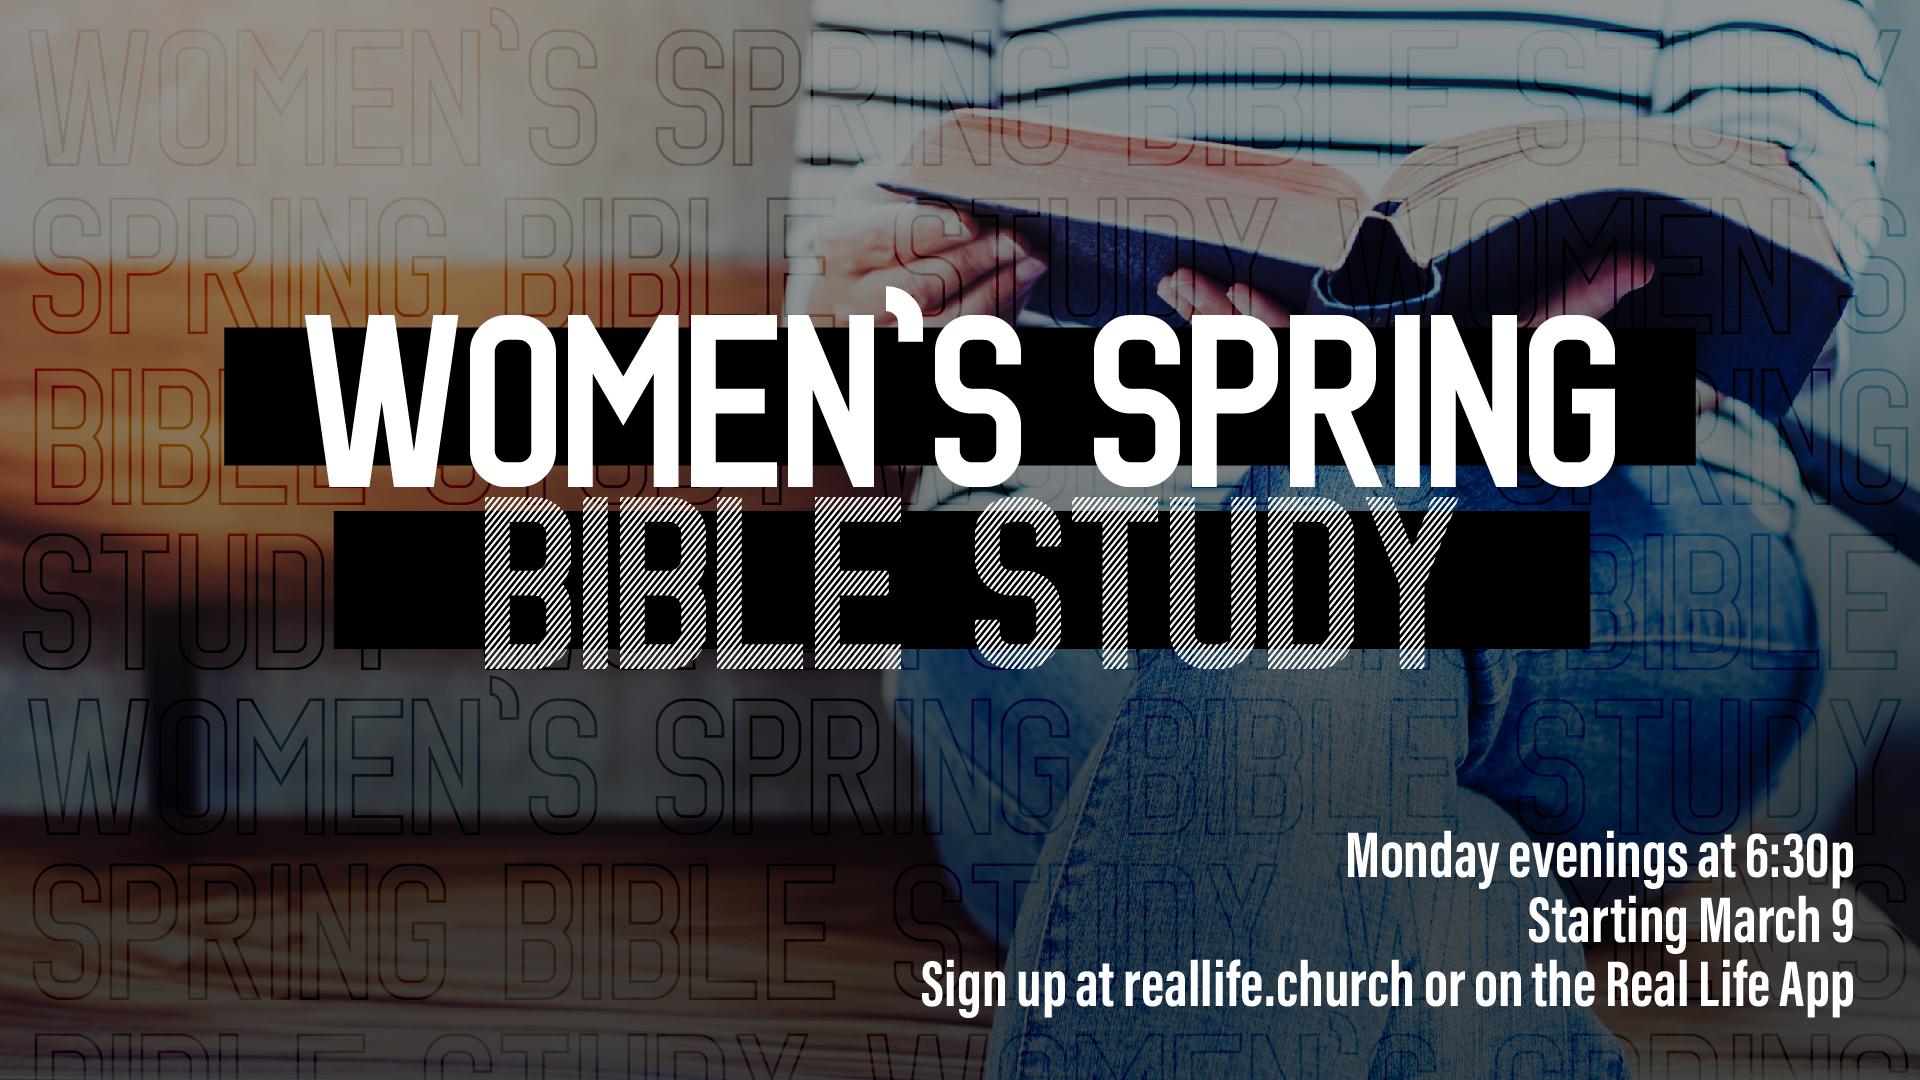 Women's Spring Bible Study - Mondays